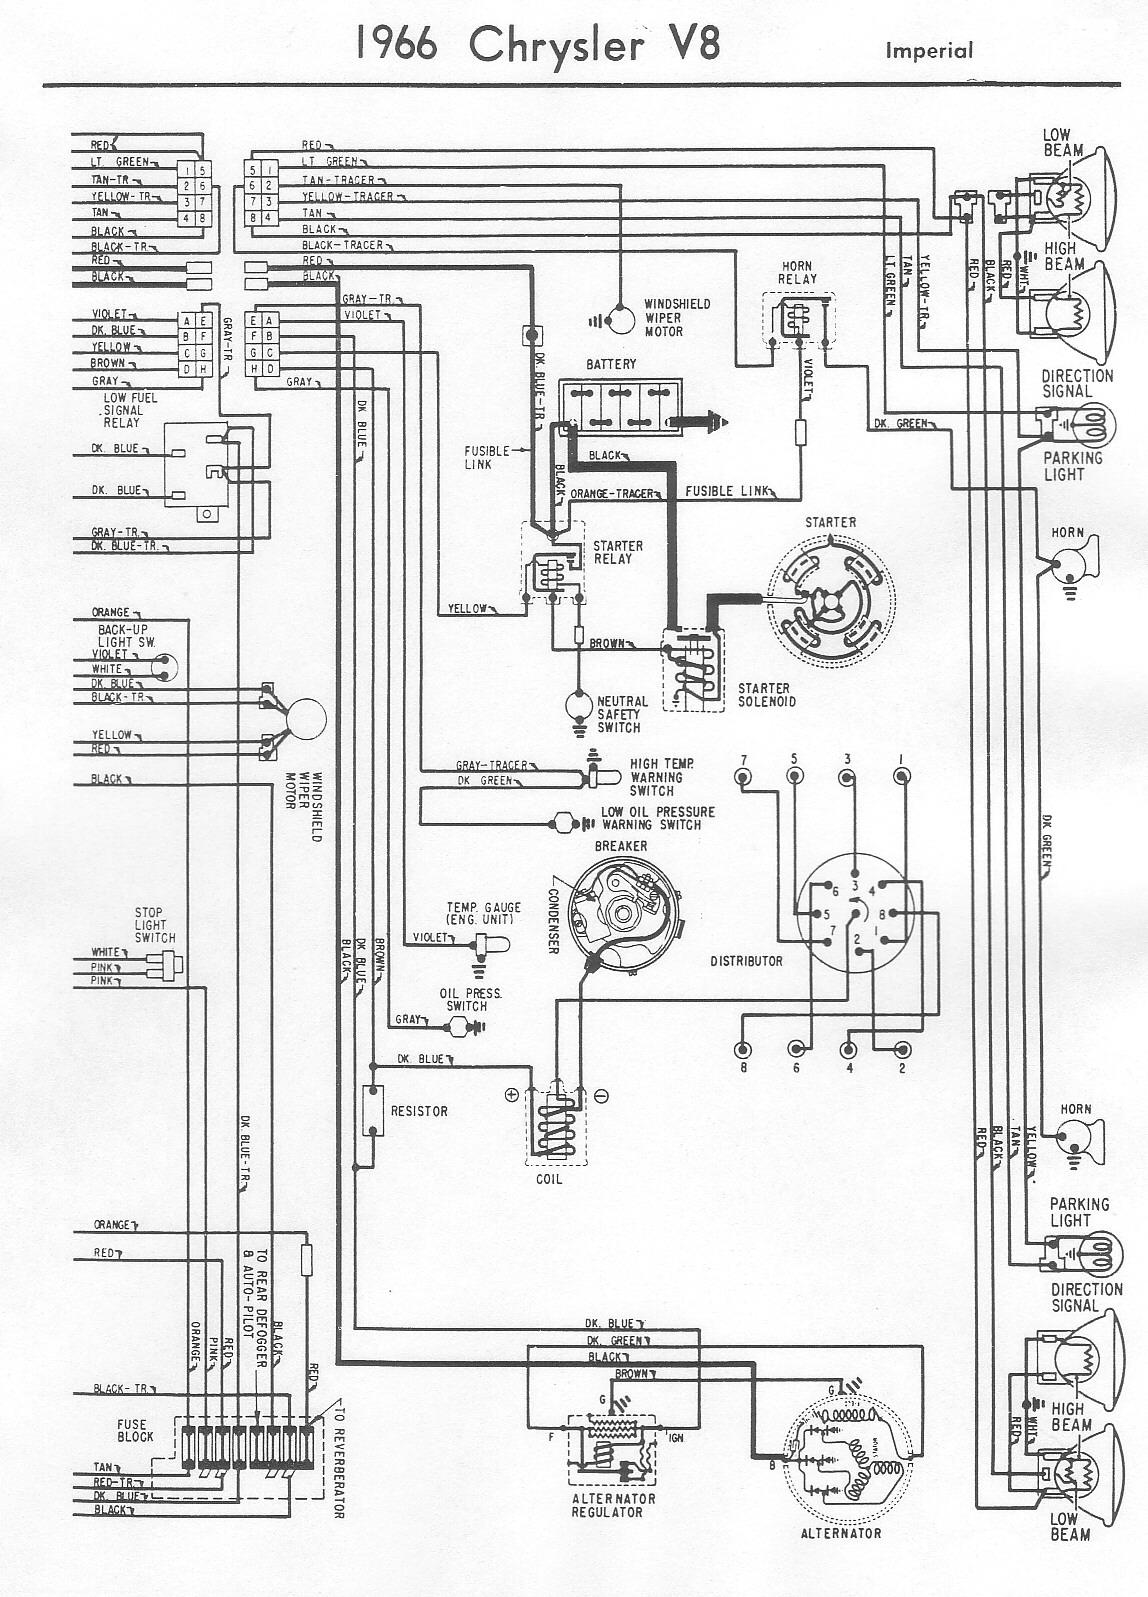 Free Download Rg570 Wiring Diagram - Schematics Online on 1971 jeep wagoneer wiring-diagram, 1970 buick skylark wiring-diagram, 1970 ford mustang wiring-diagram, 1983 jeep cj7 wiring-diagram, 1970 dodge challenger wiring-diagram, 1970 jeep truck, 1970 jeep wrangler, 1970 pontiac gto wiring-diagram, 1970 mercury cougar wiring-diagram, 1970 dodge coronet wiring-diagram, 1981 jeep cj8 wiring-diagram, 1970 ford torino wiring-diagram, 2002 jeep liberty wiring-diagram,